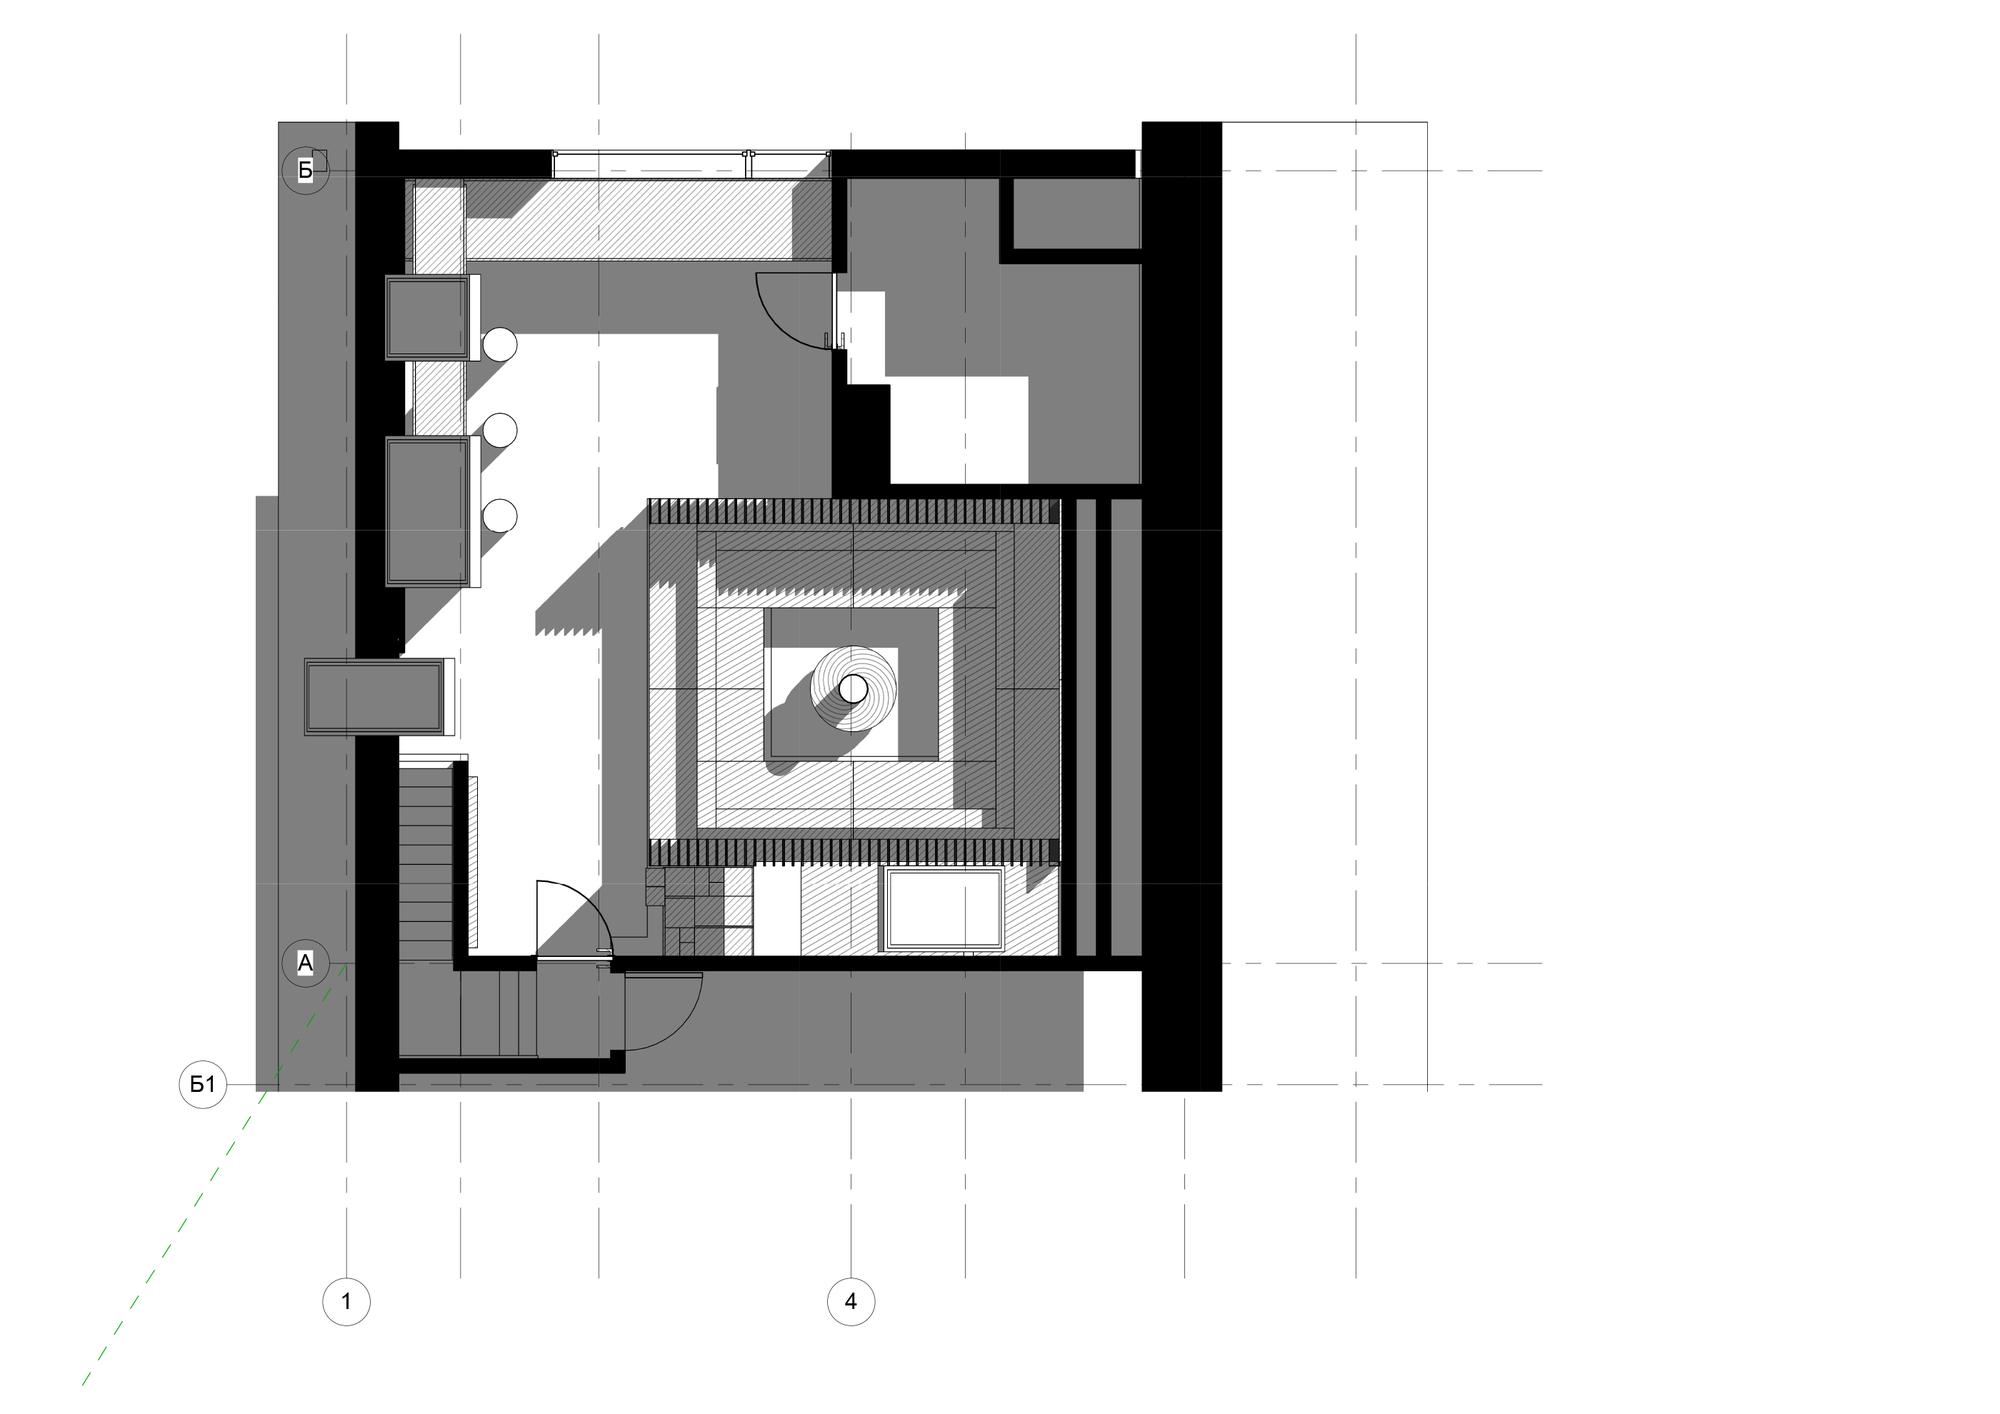 Around_fireplace-Ruetemple-20.png